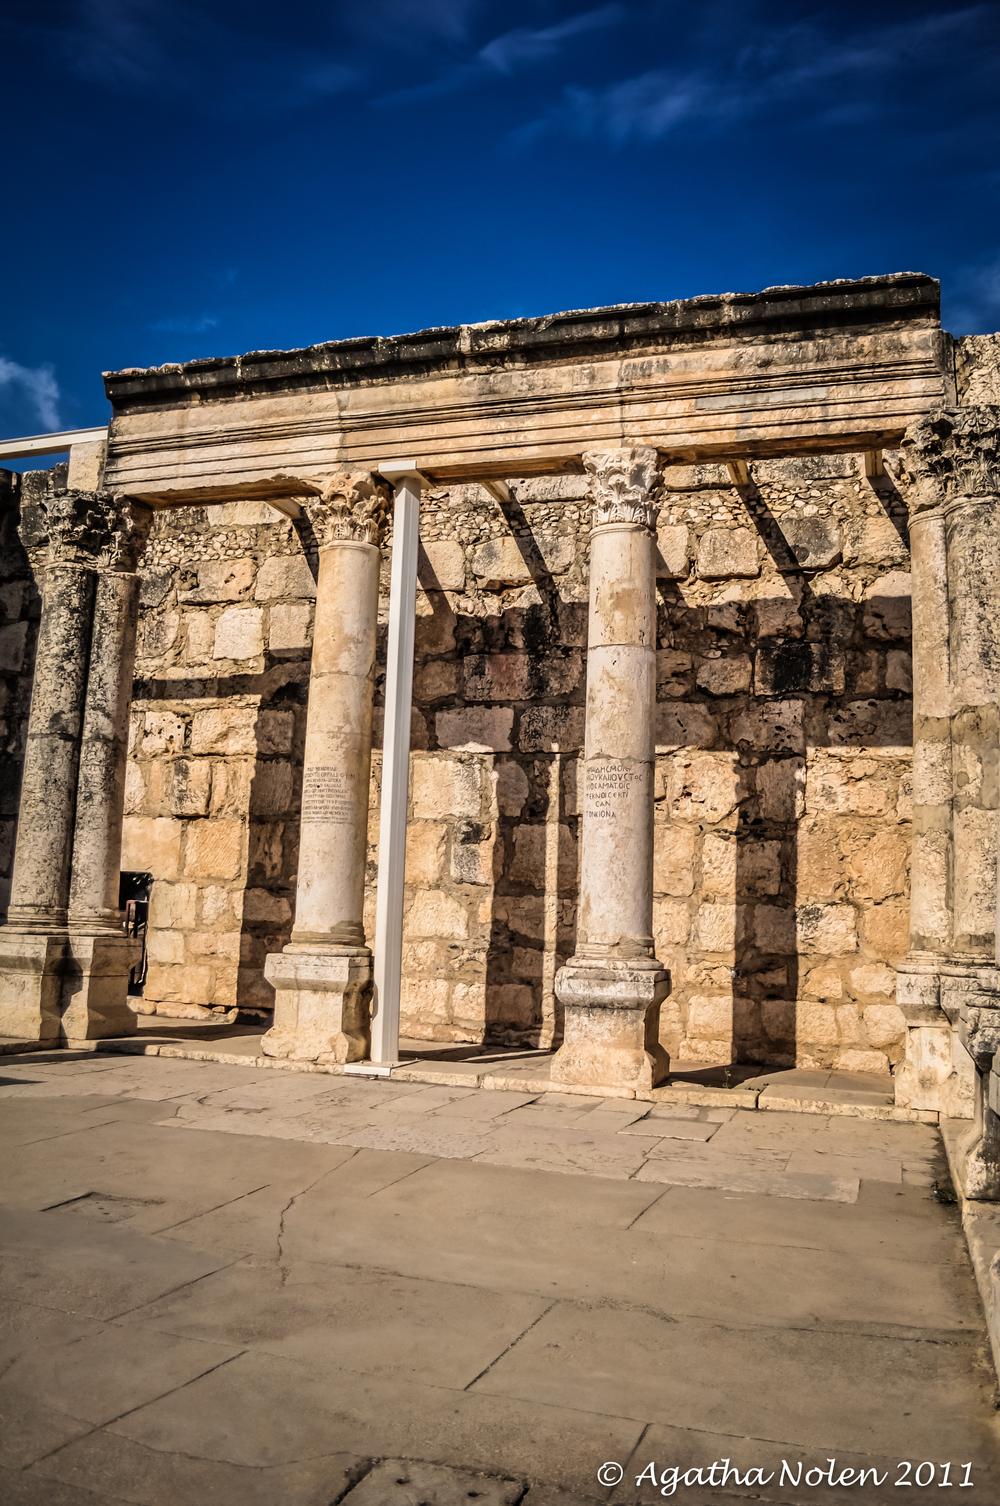 Jewish Synagogue, 4th Cent. AD, Capernaum, Israel